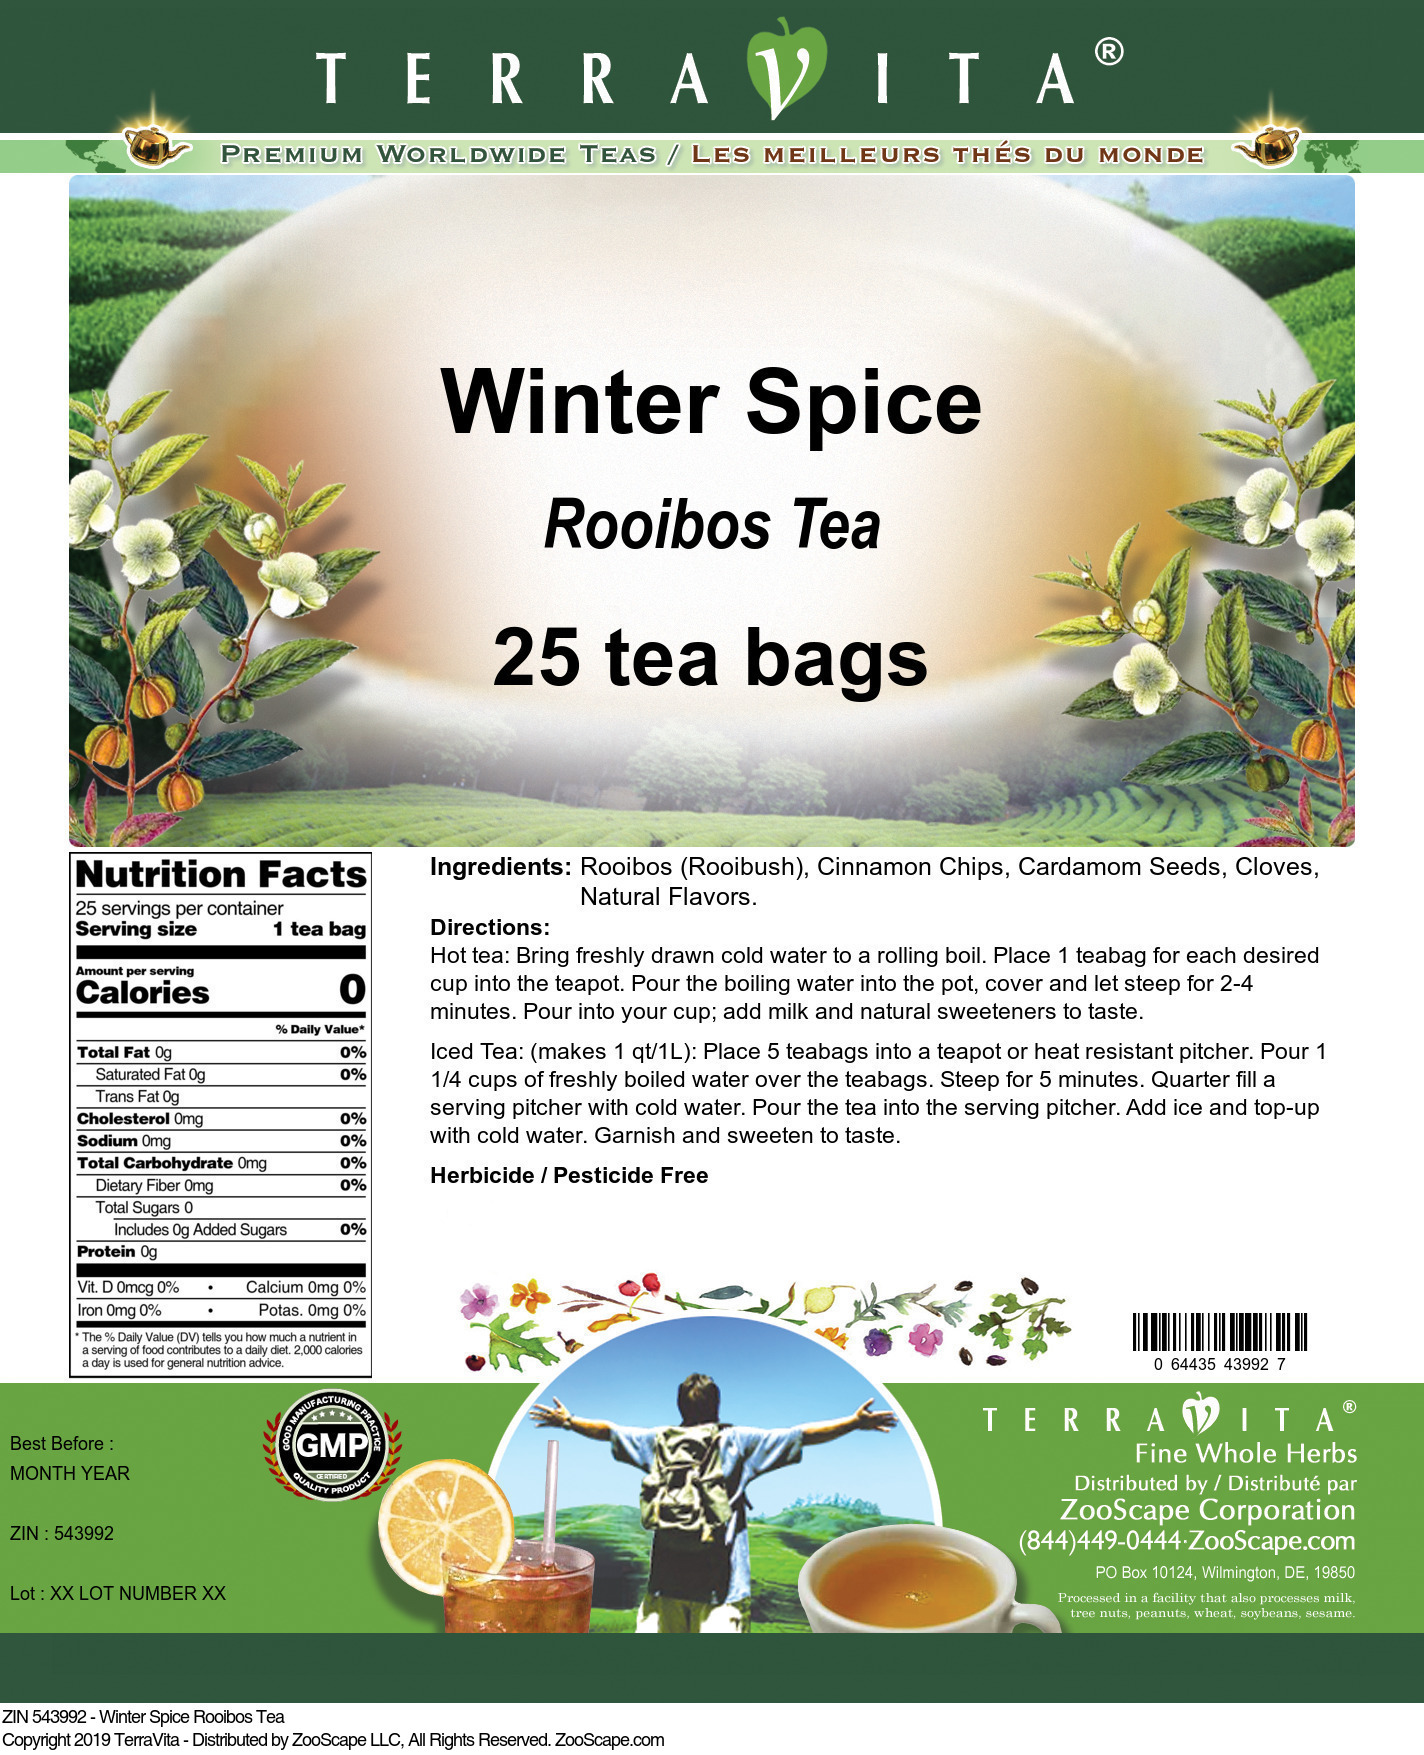 Winter Spice Rooibos Tea